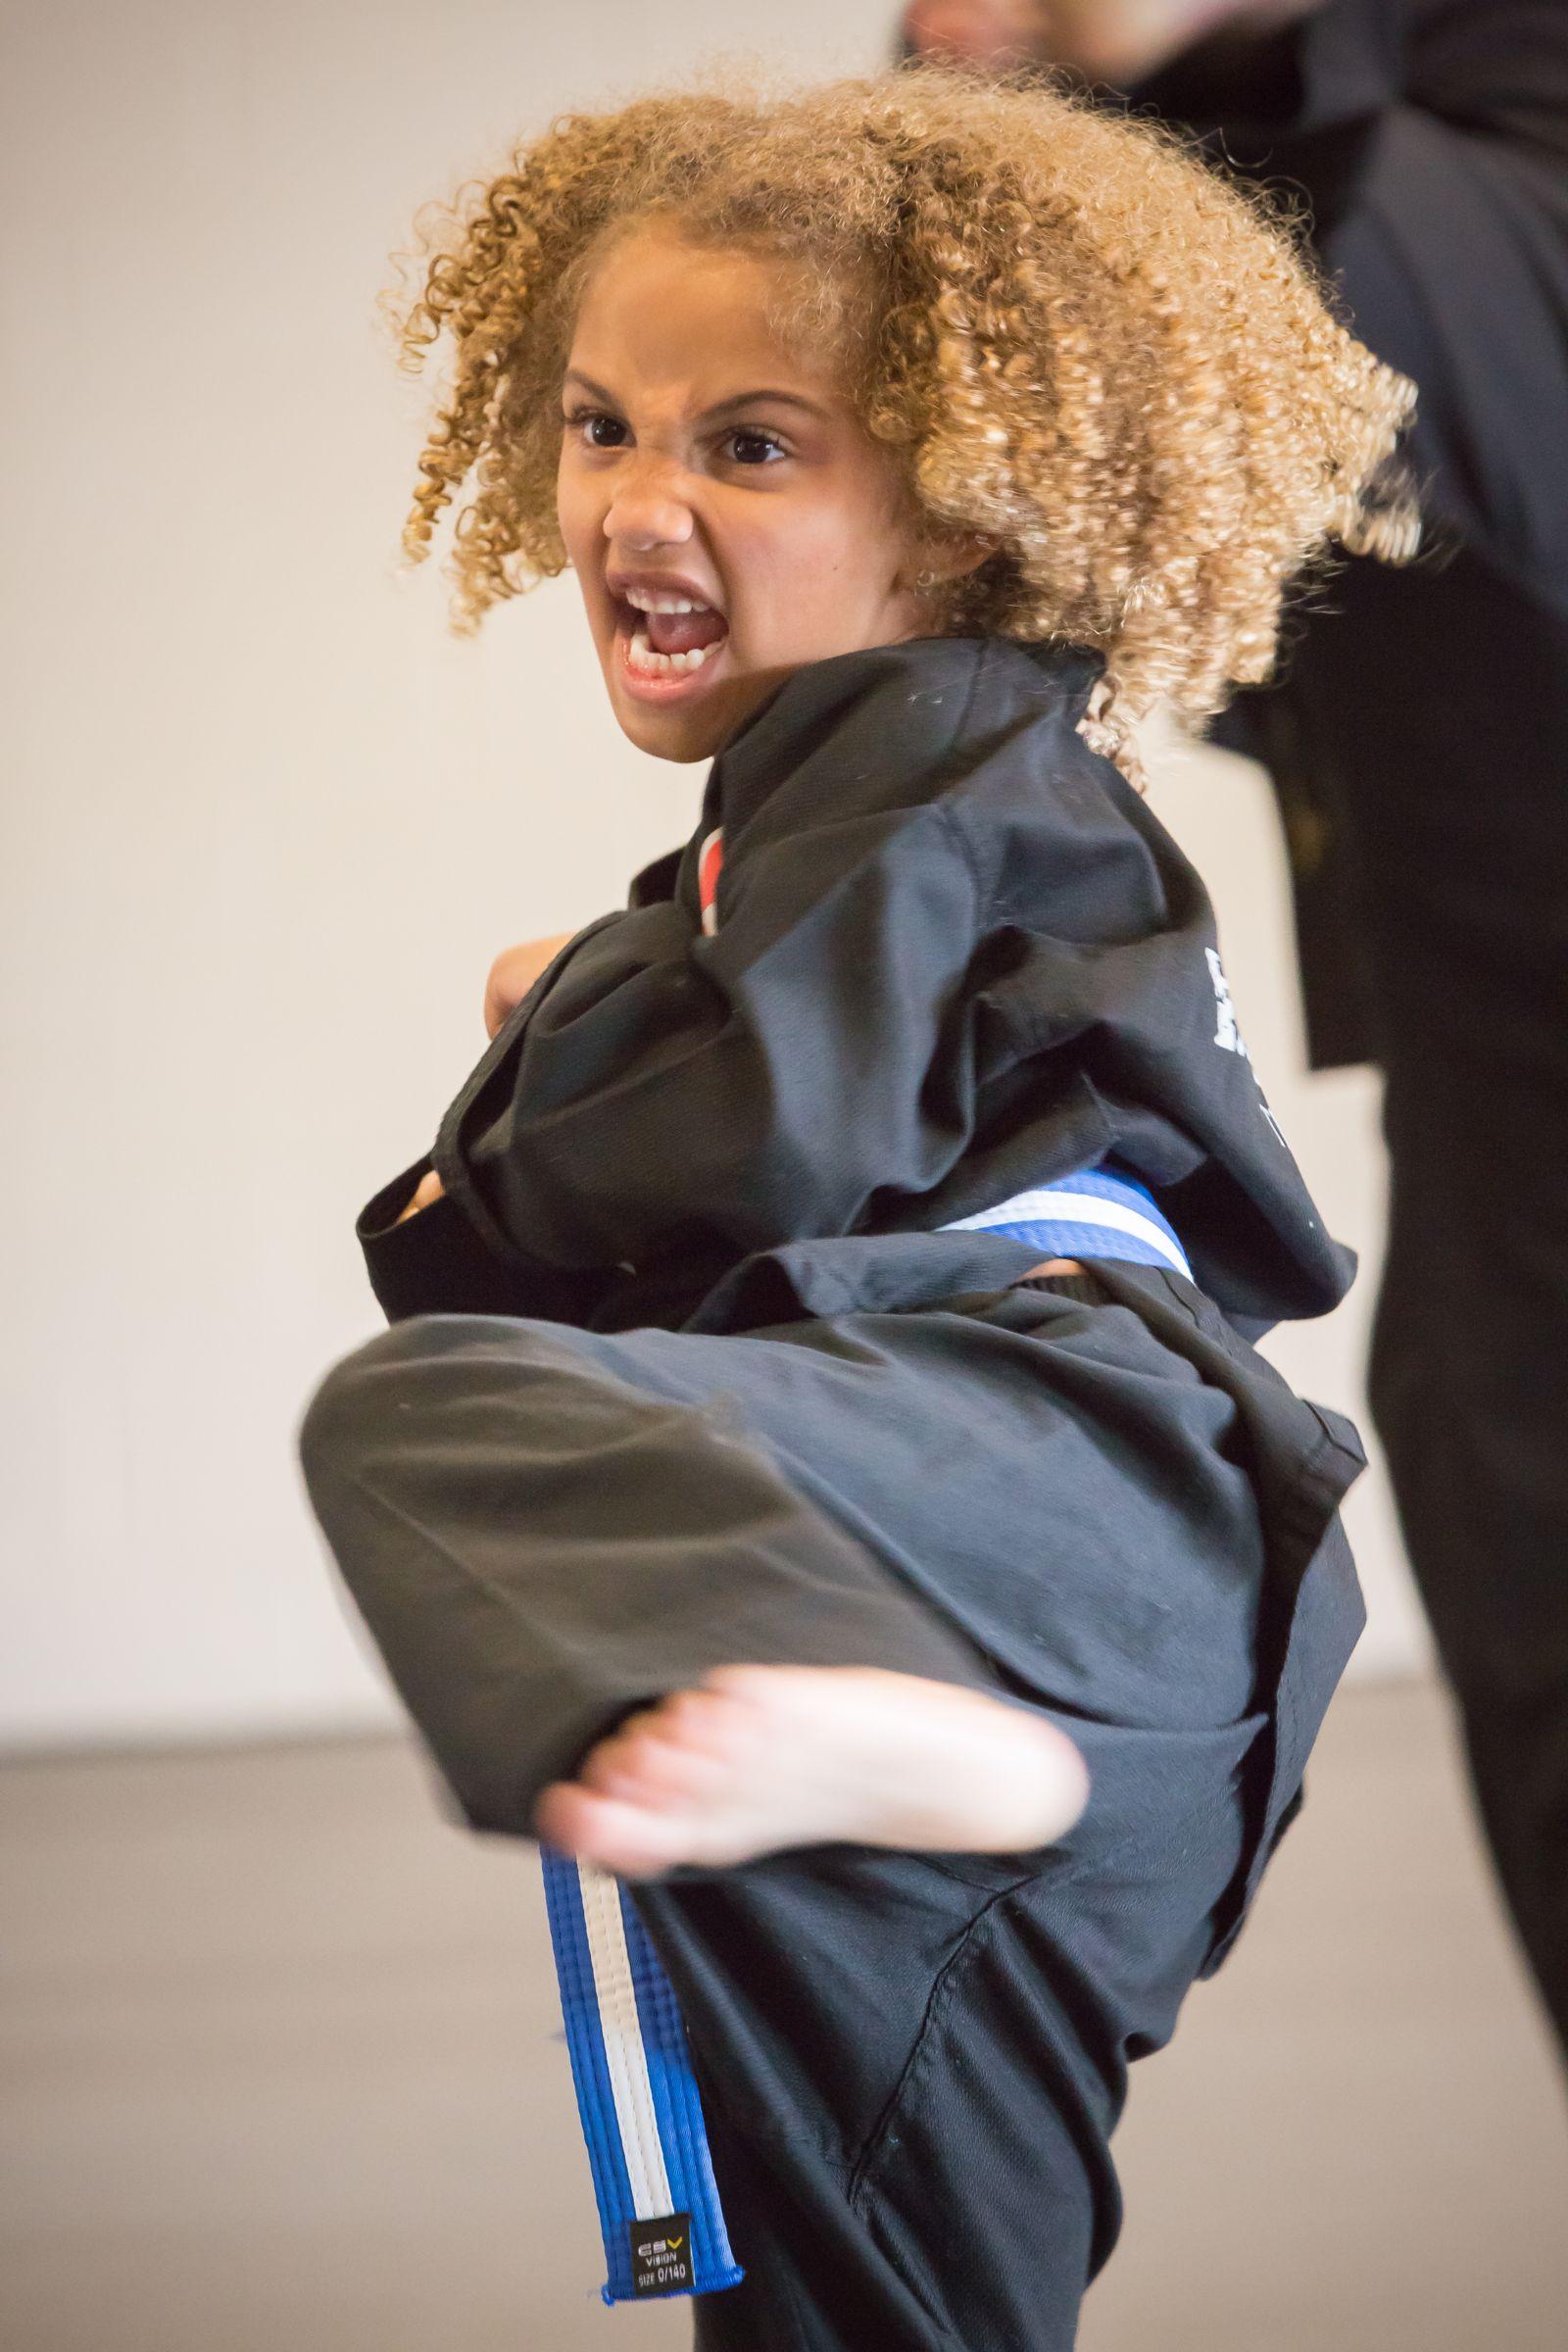 Kids Karate martial arts taekwondo Exton, PA Berwyn PA